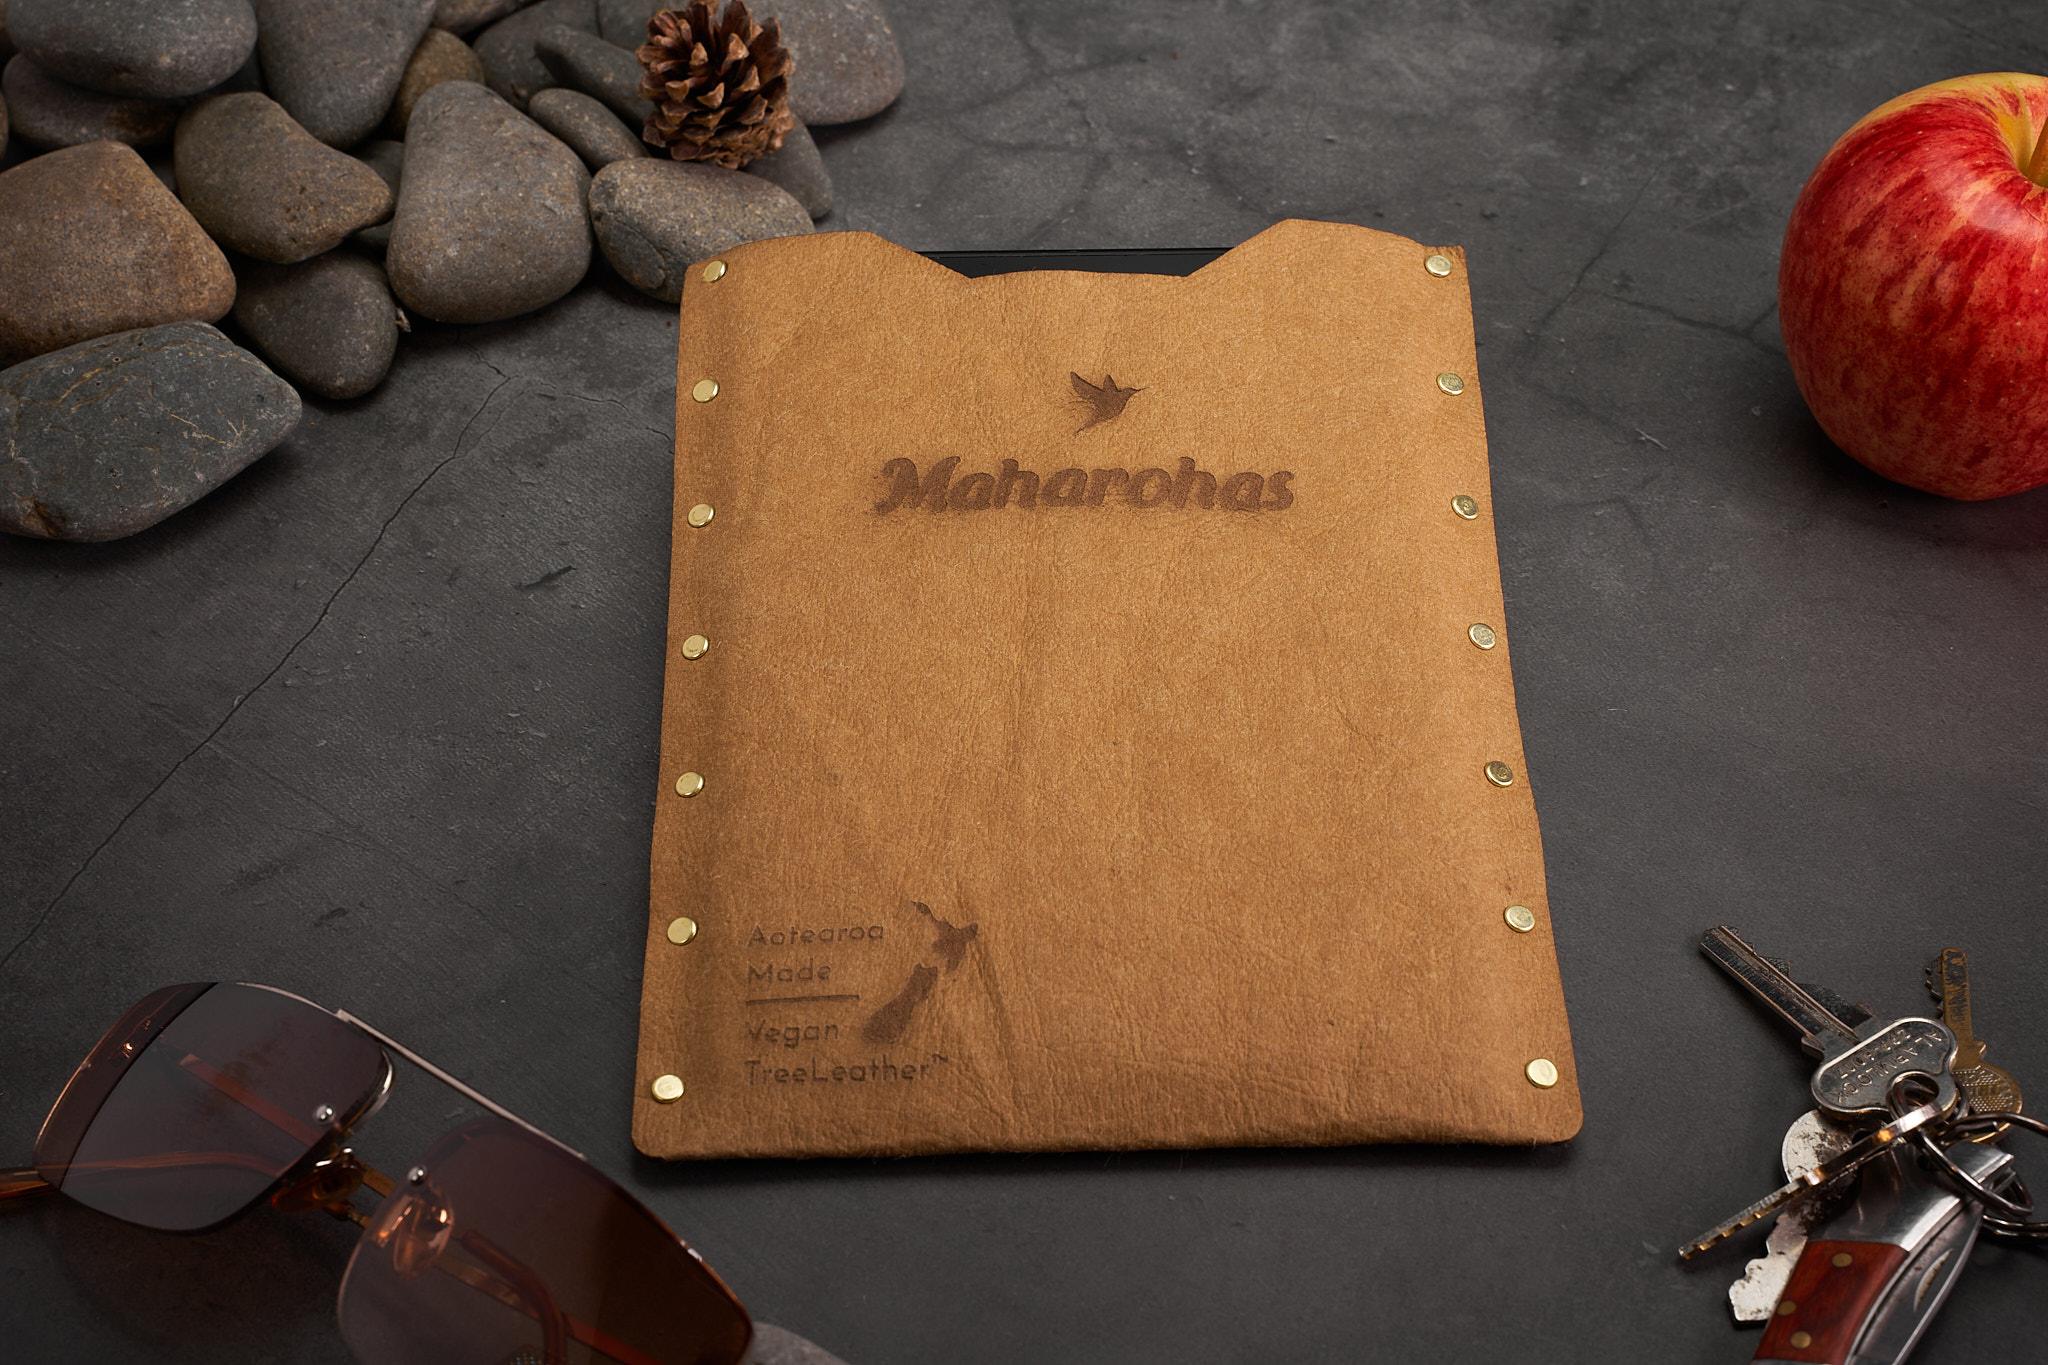 Maharohas 051 FBweb